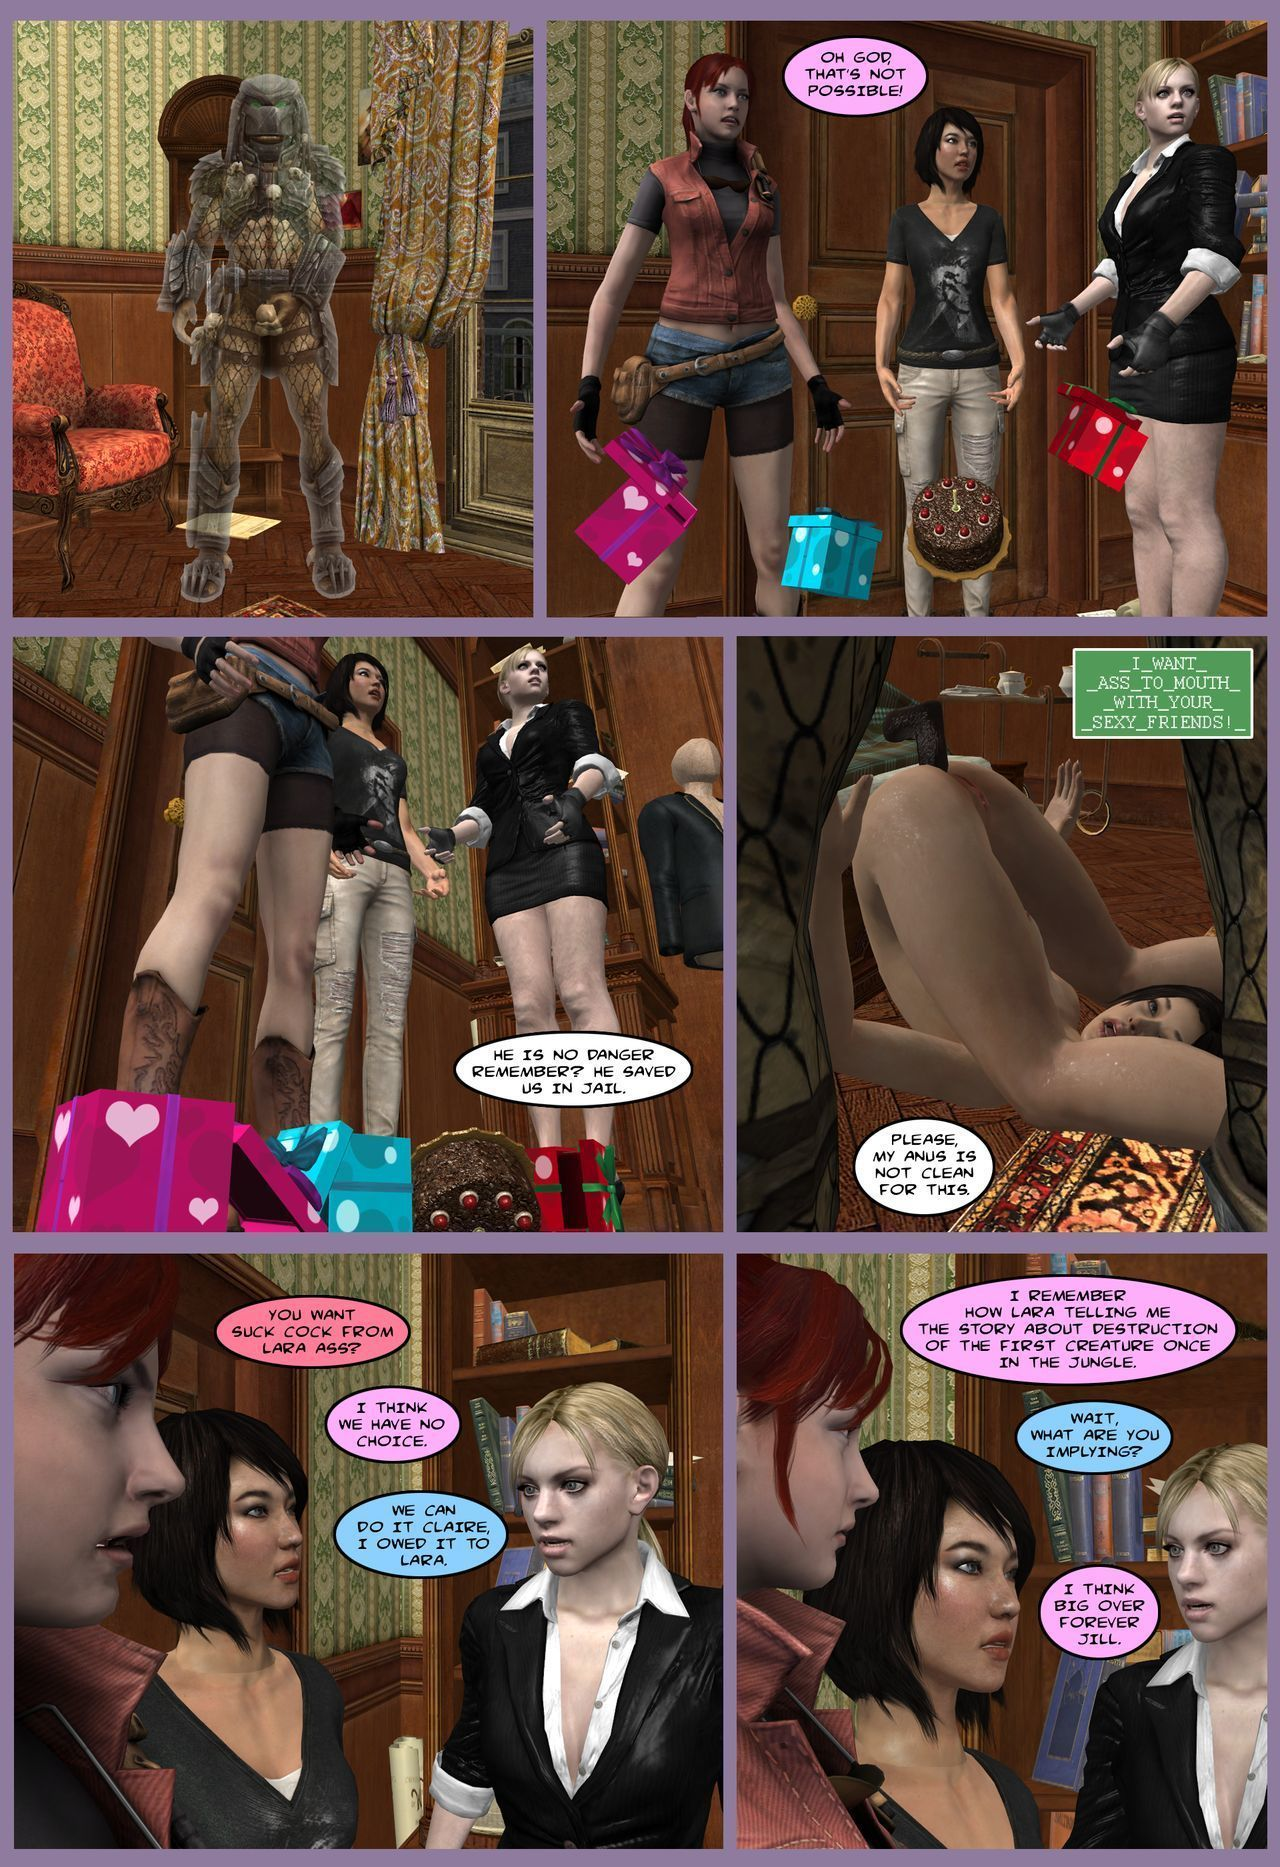 Lady & Cop VS Penetrator 5 (Chapter 1)